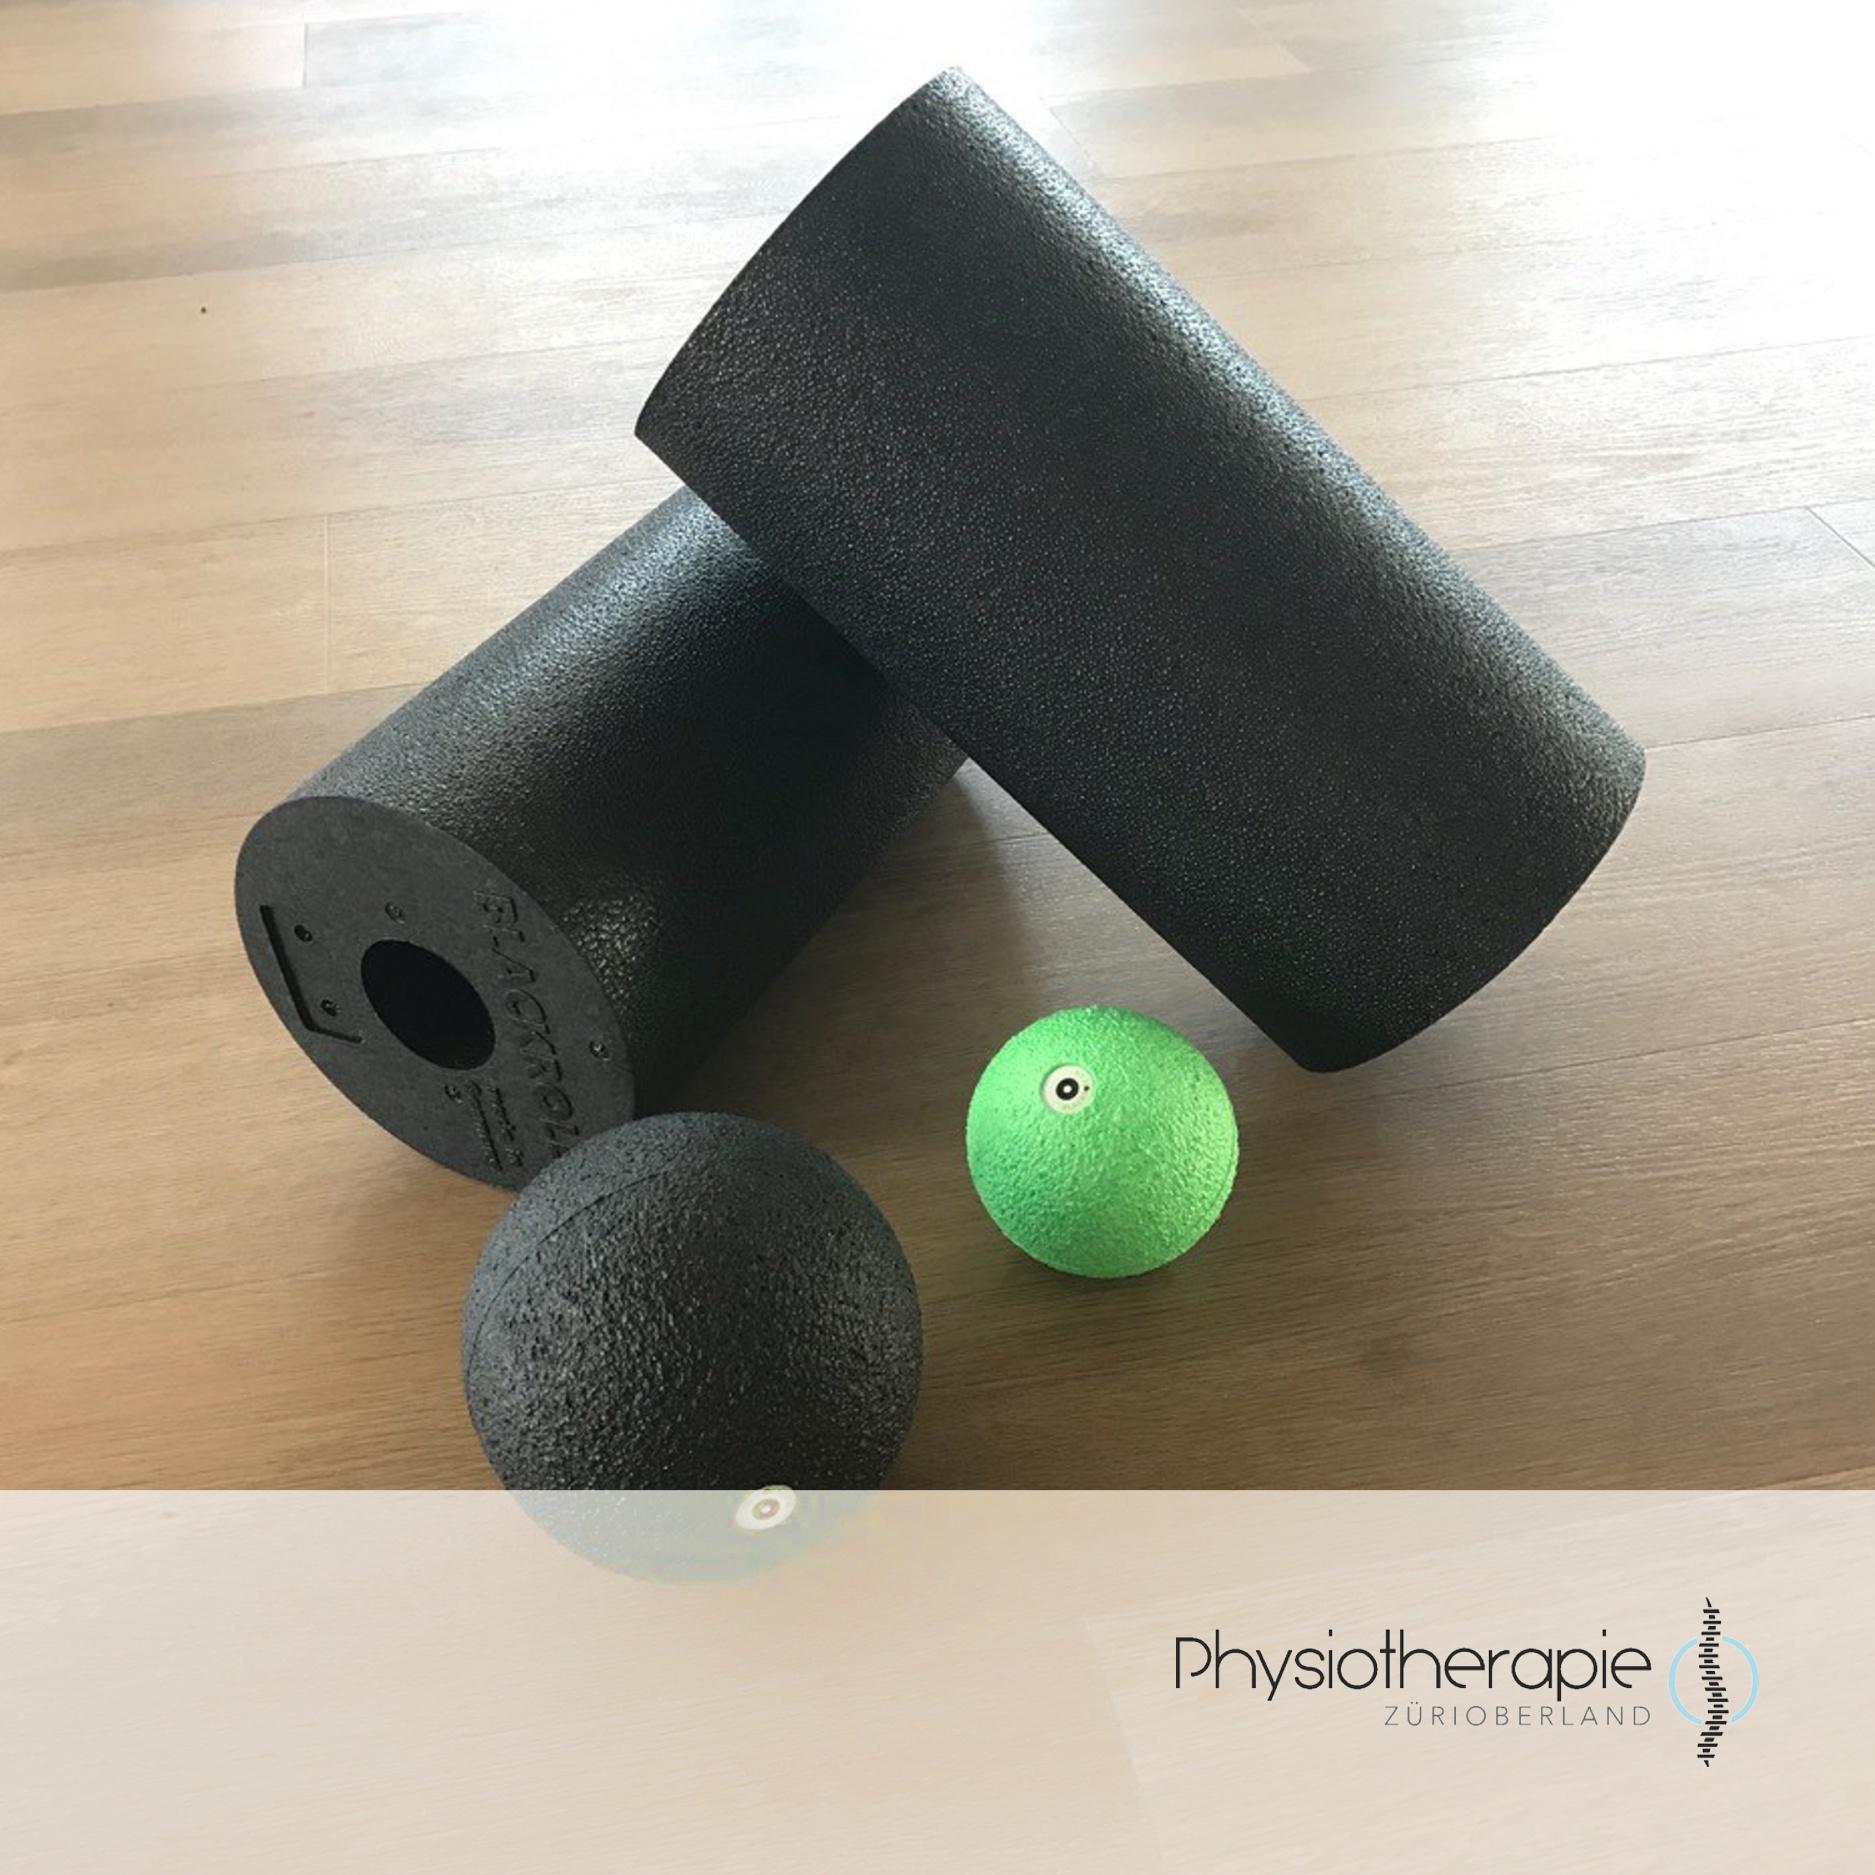 Physiotherapie ZüriOberland Faszio Aktion